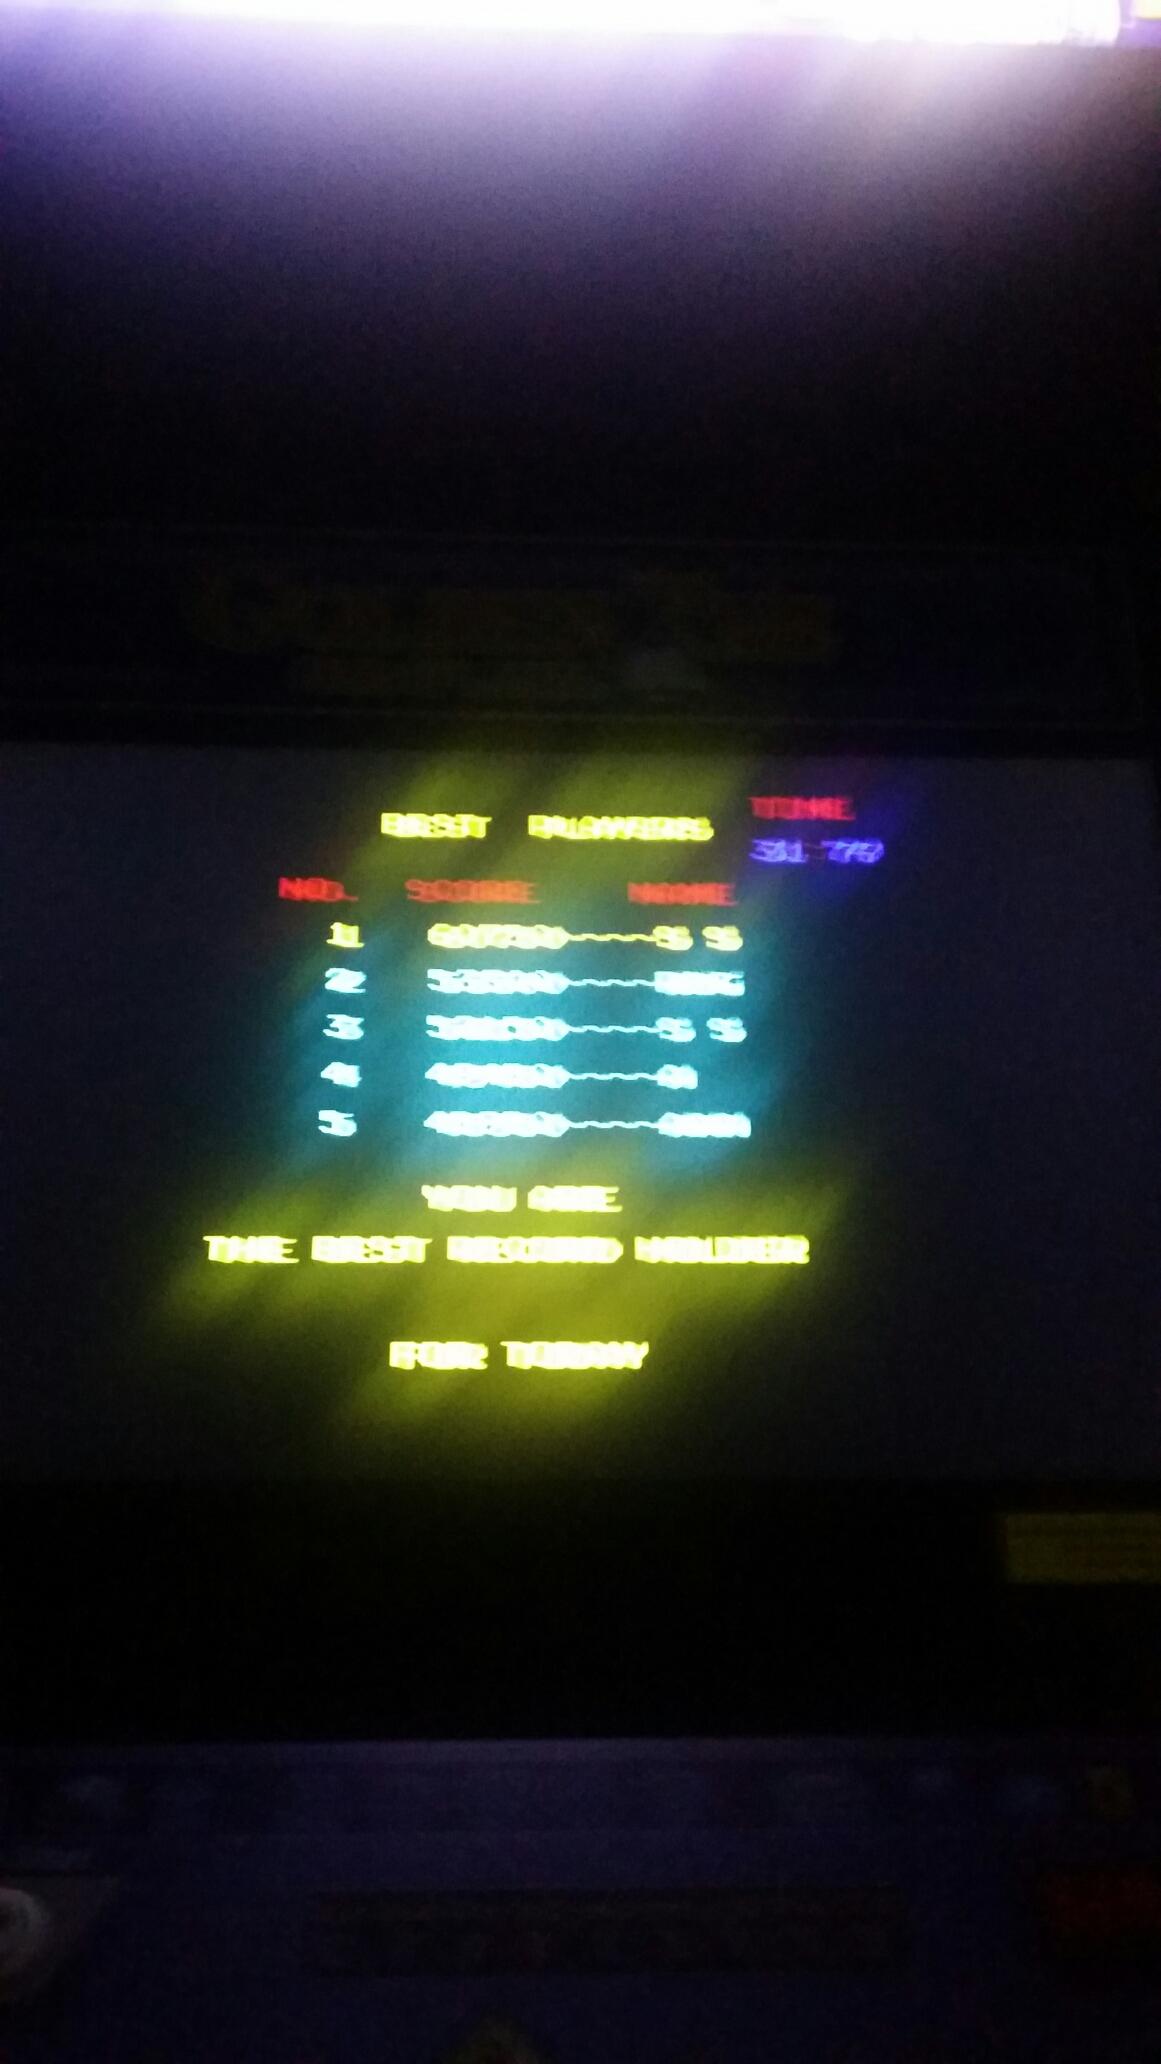 SeanStewart: 10 Yard Fight (Arcade Emulated / M.A.M.E.) 60,750 points on 2017-12-20 20:57:48